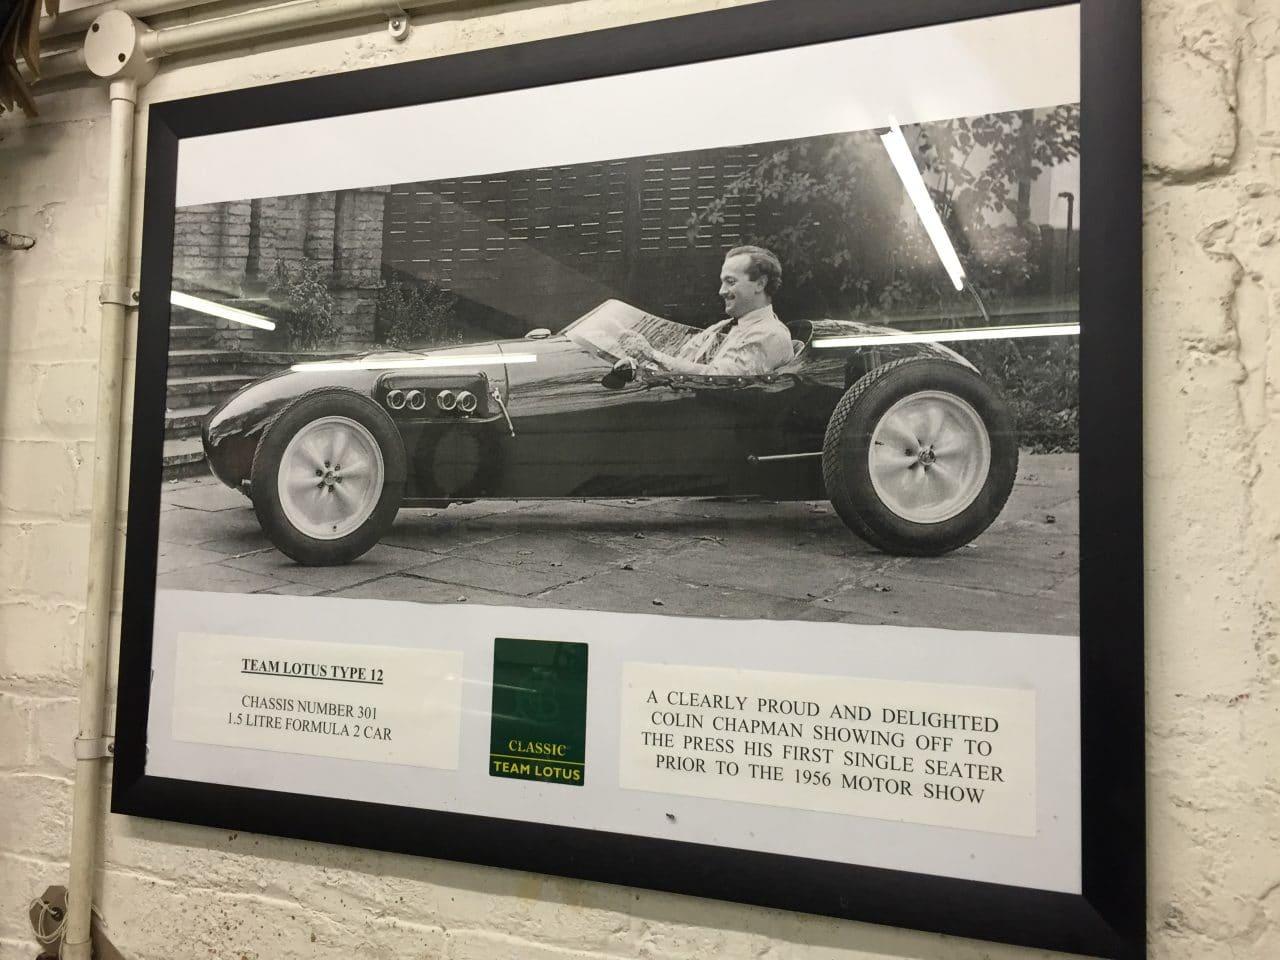 Colin Chapman Lotus type 12